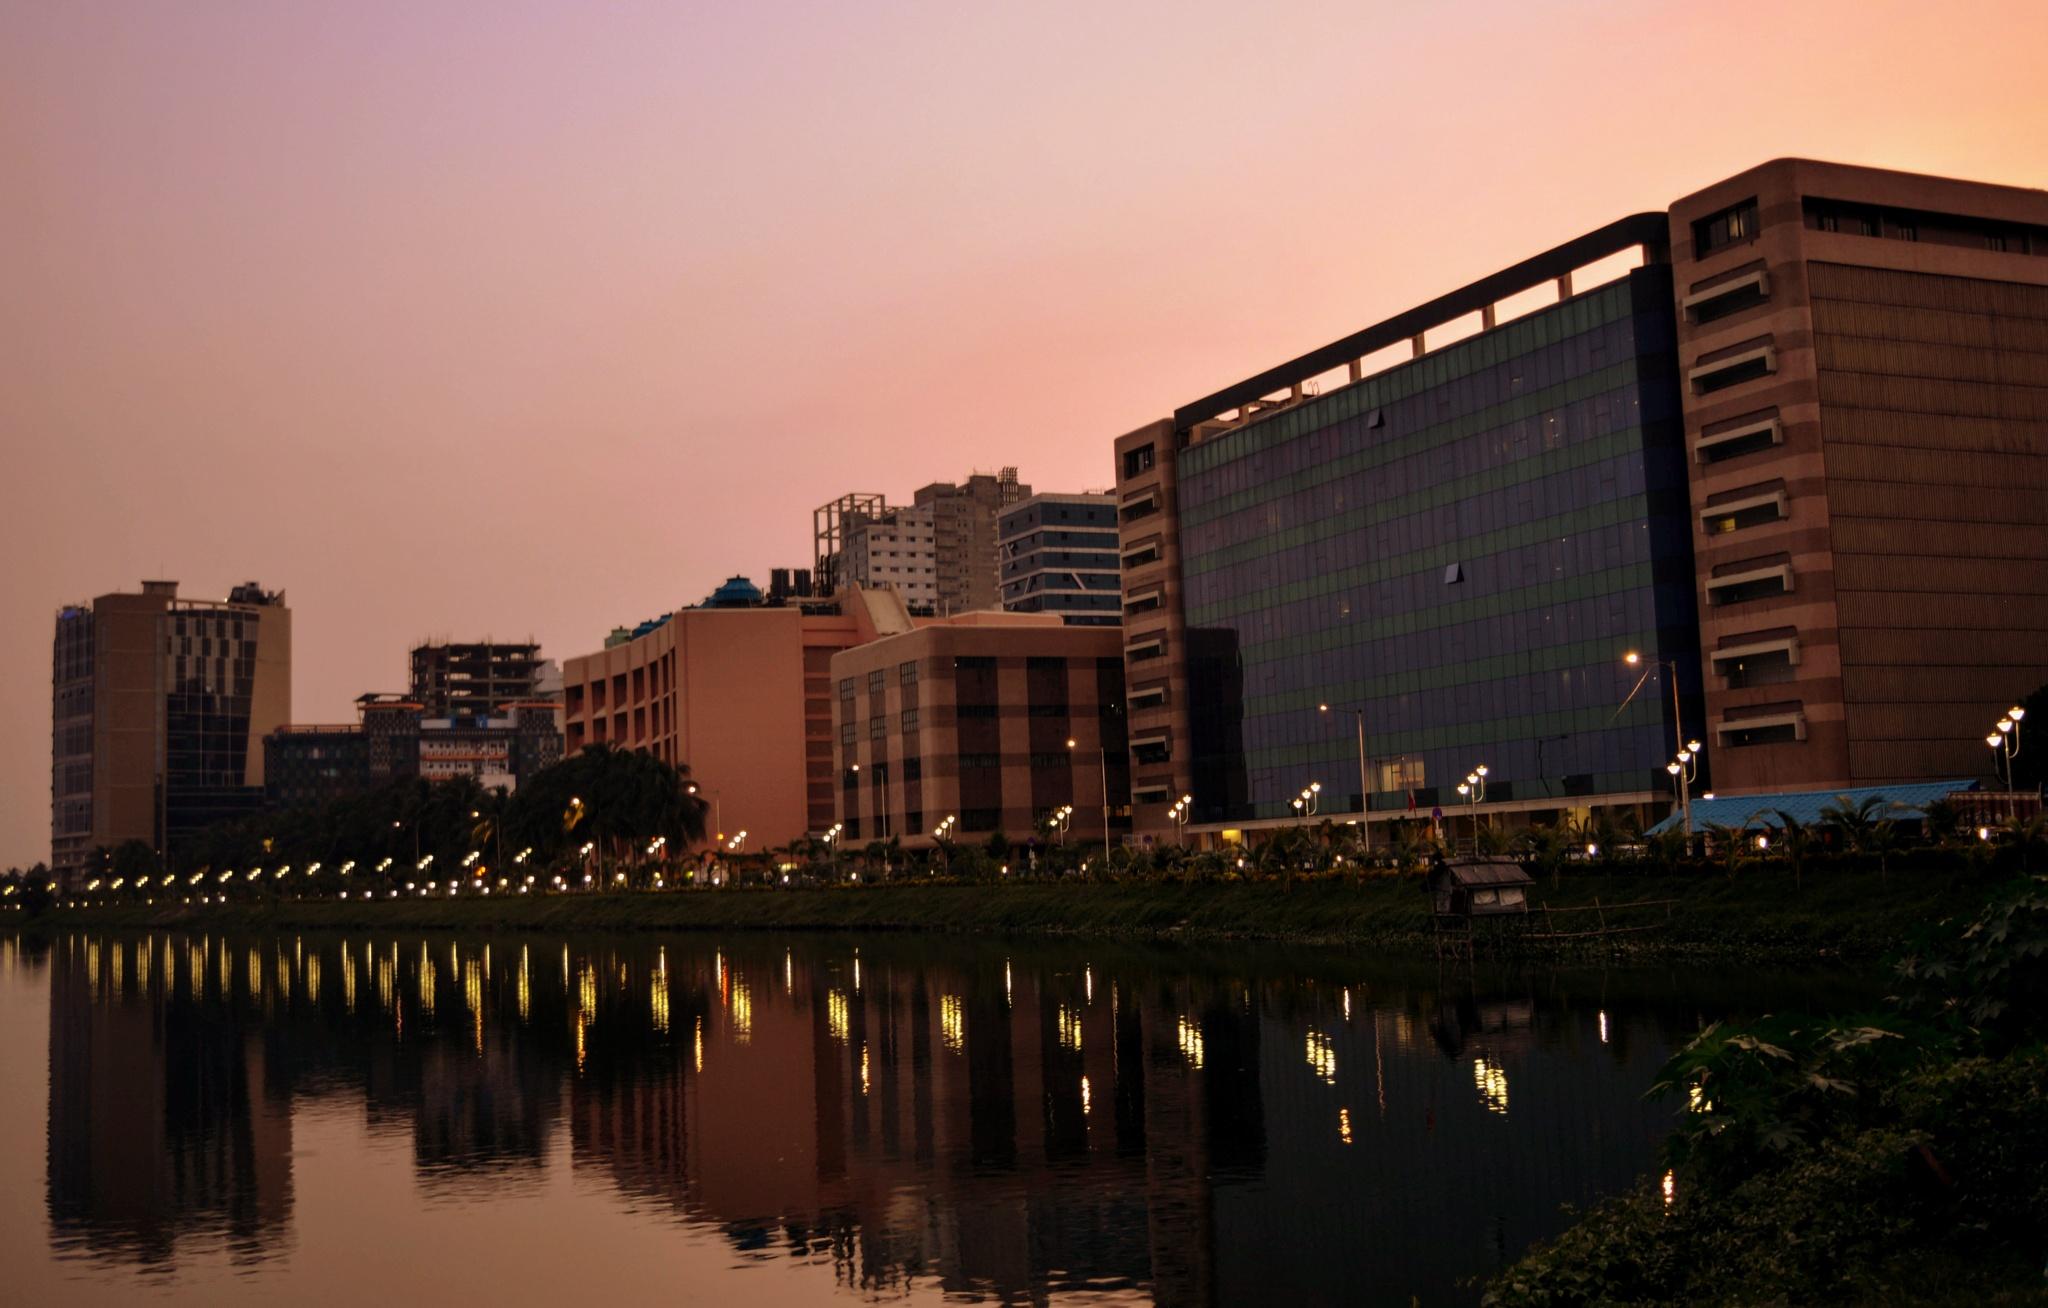 City View by pritam.dutta.20